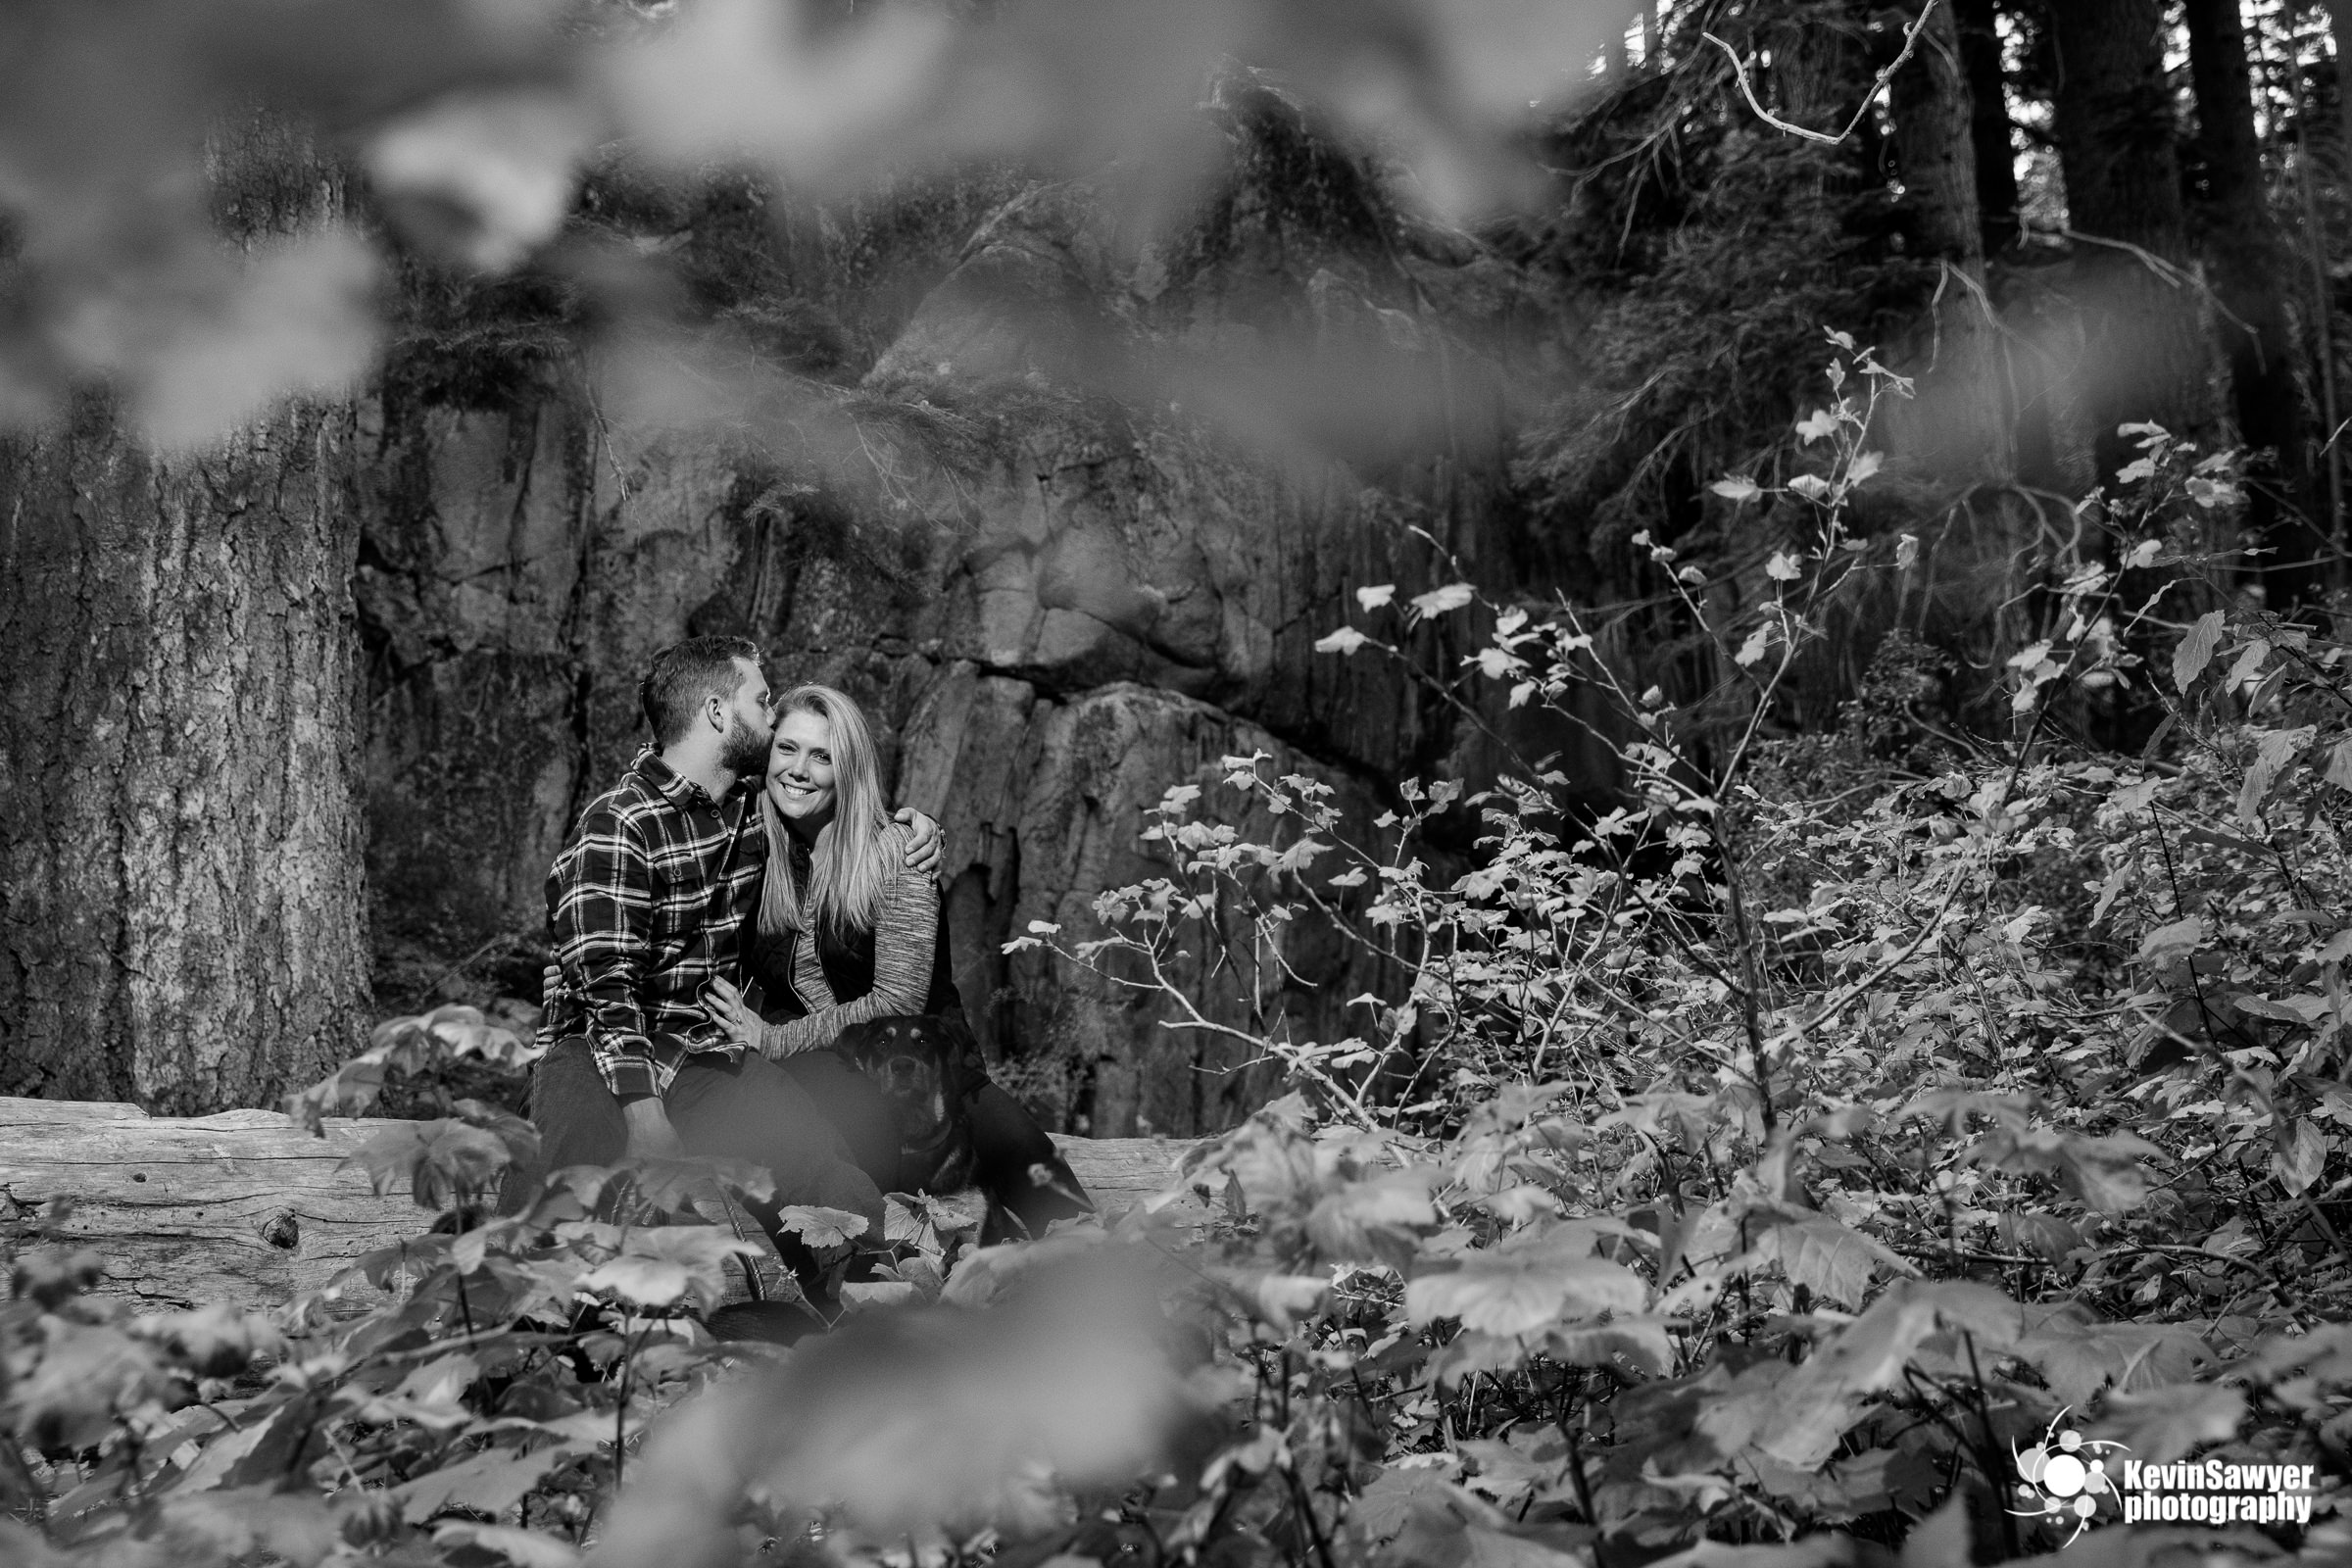 lake-tahoe-wedding-photographer-proposal-engagement-emerald-bay-portraits-love-southlake-tahoe